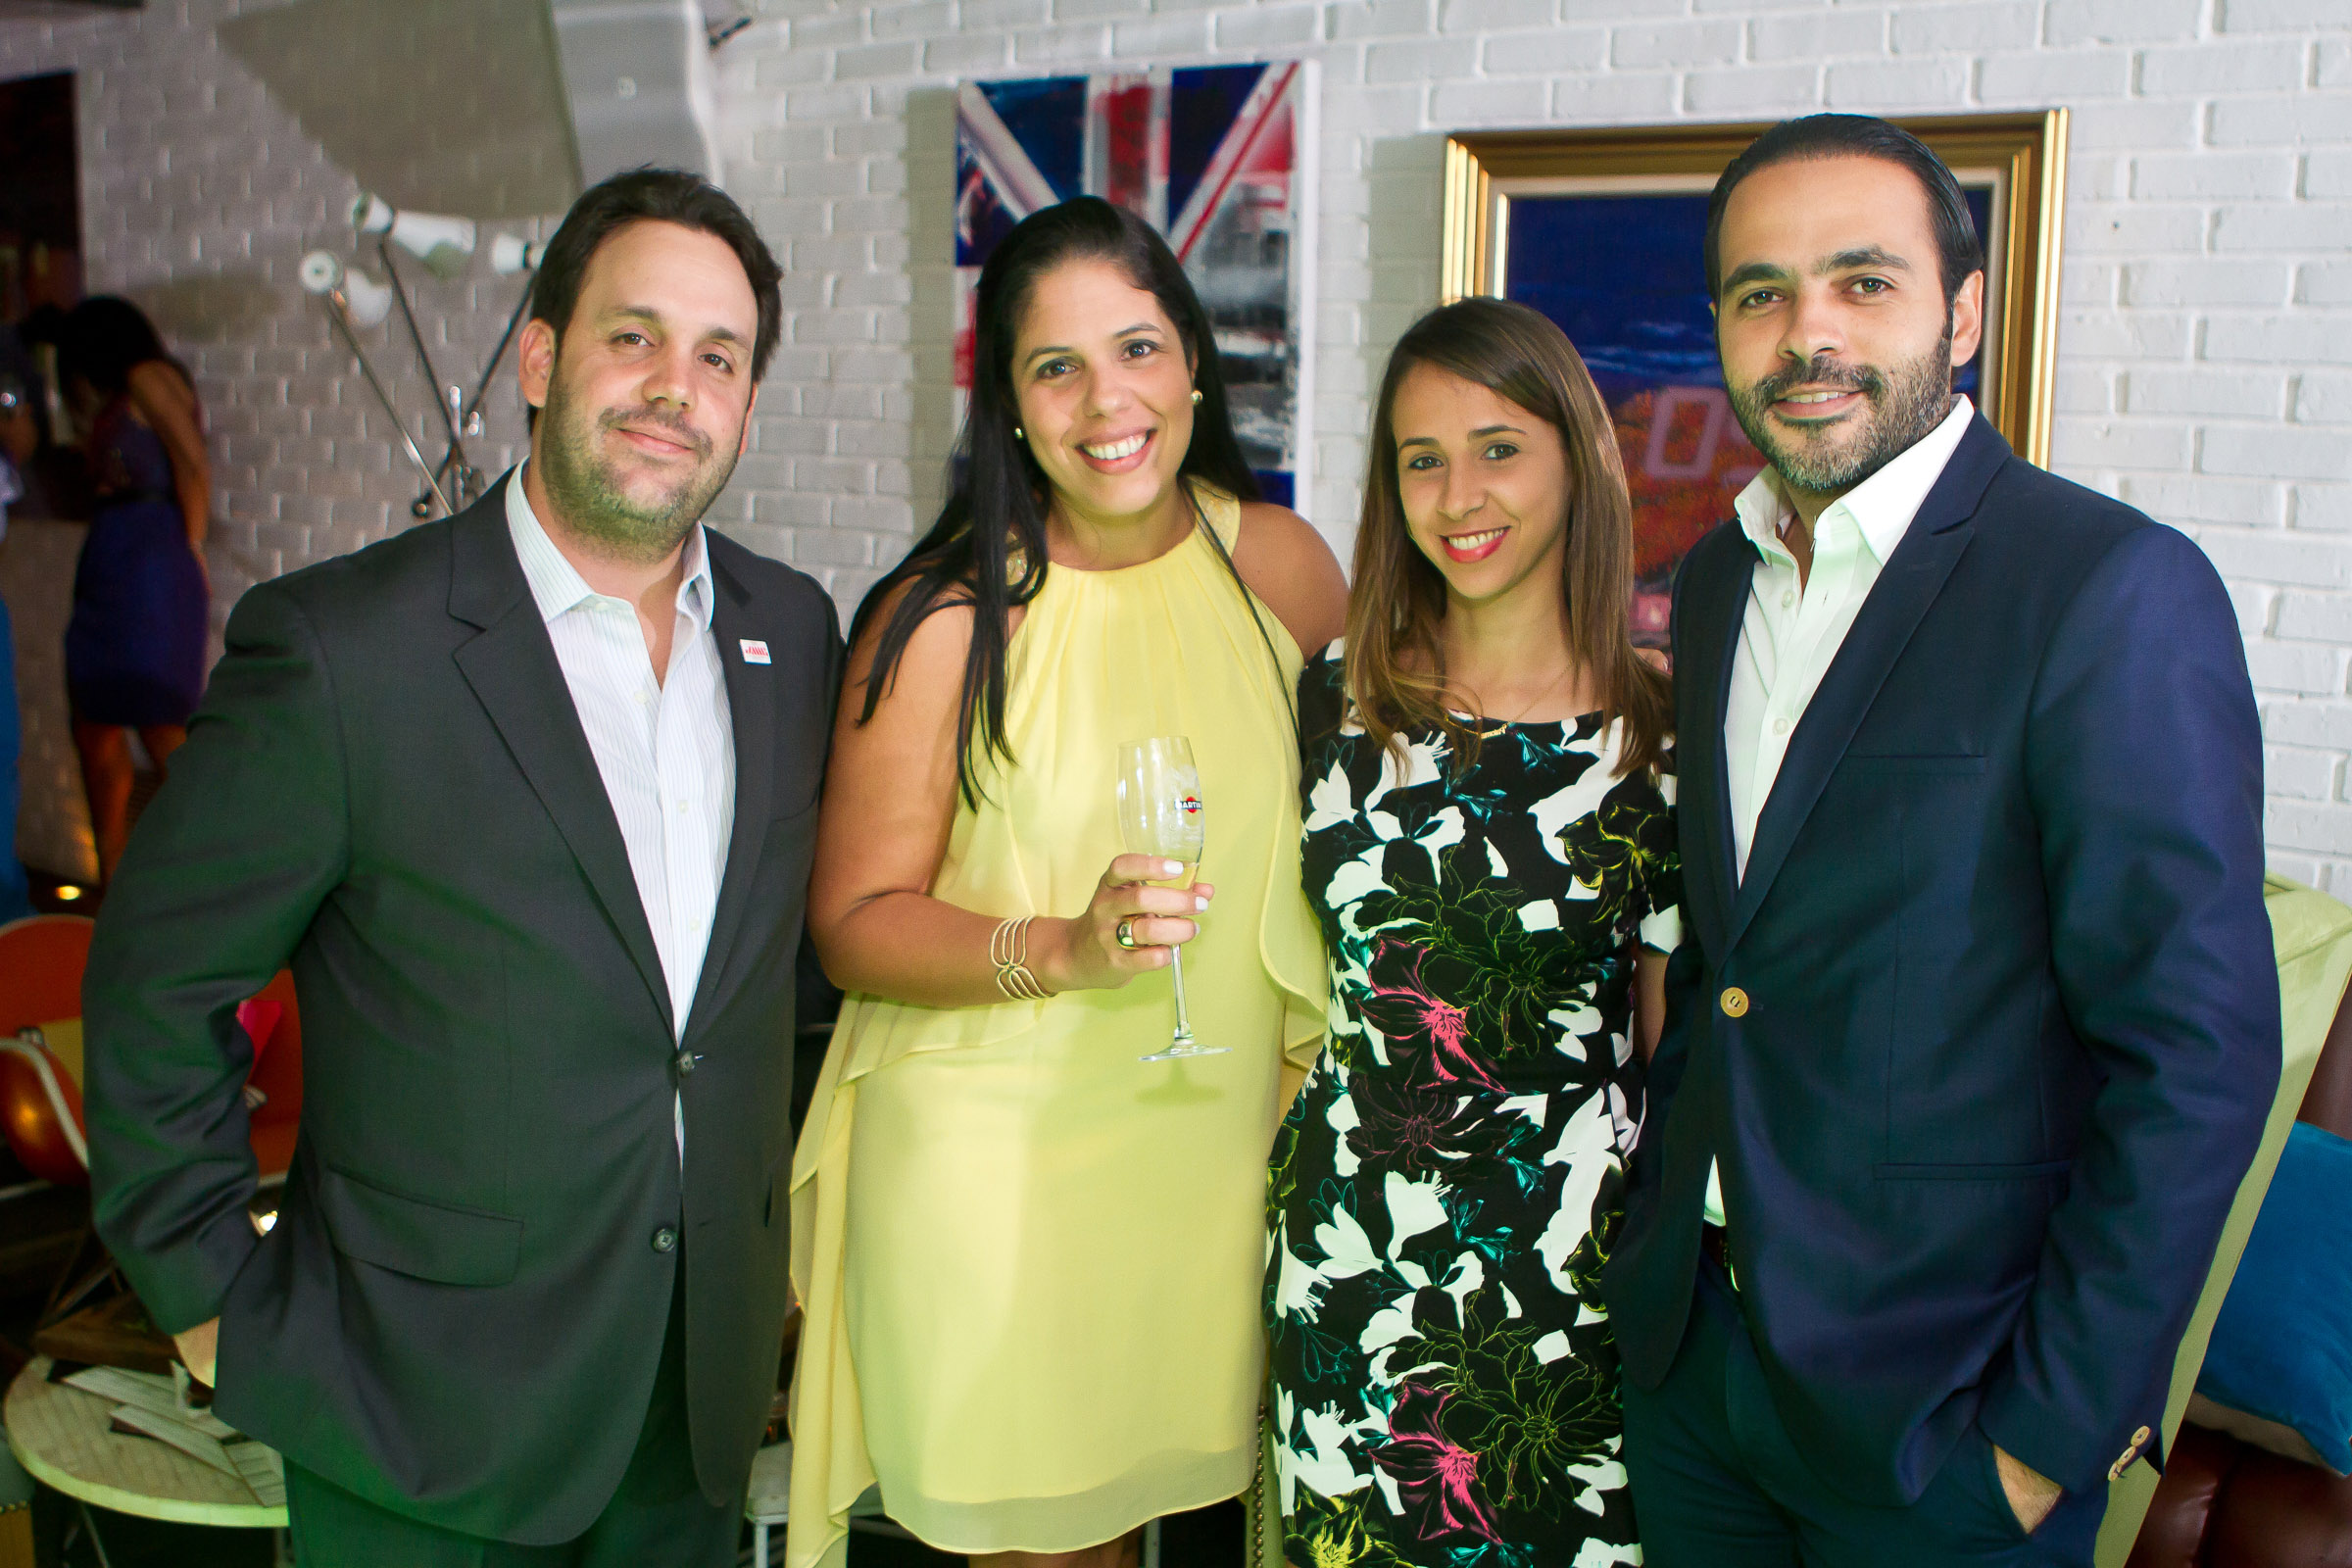 IMG_7628_Eddy Vega, Liza Andujar, Paola Salcedo,Hugo Villanueva.